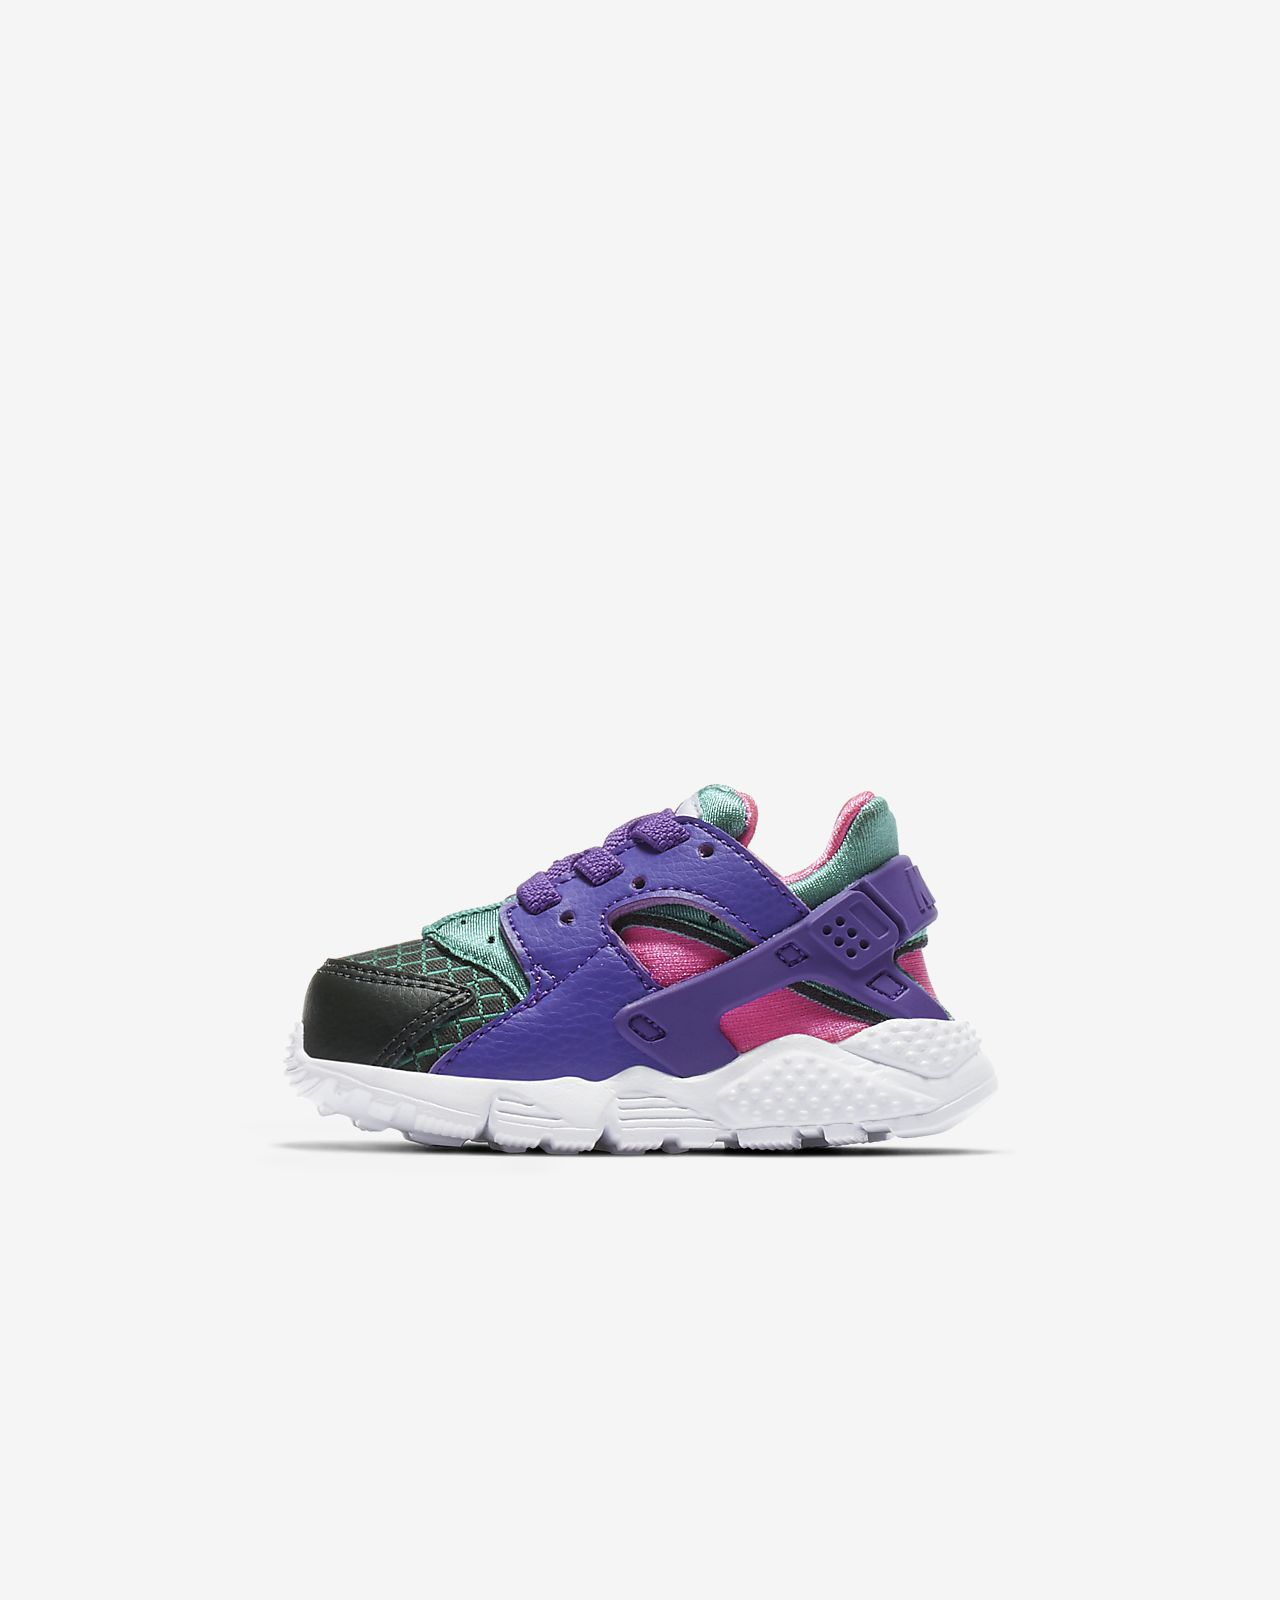 9683a71330d9e Nike Huarache Run Ultra Now Infant Toddler Shoe. Nike.com